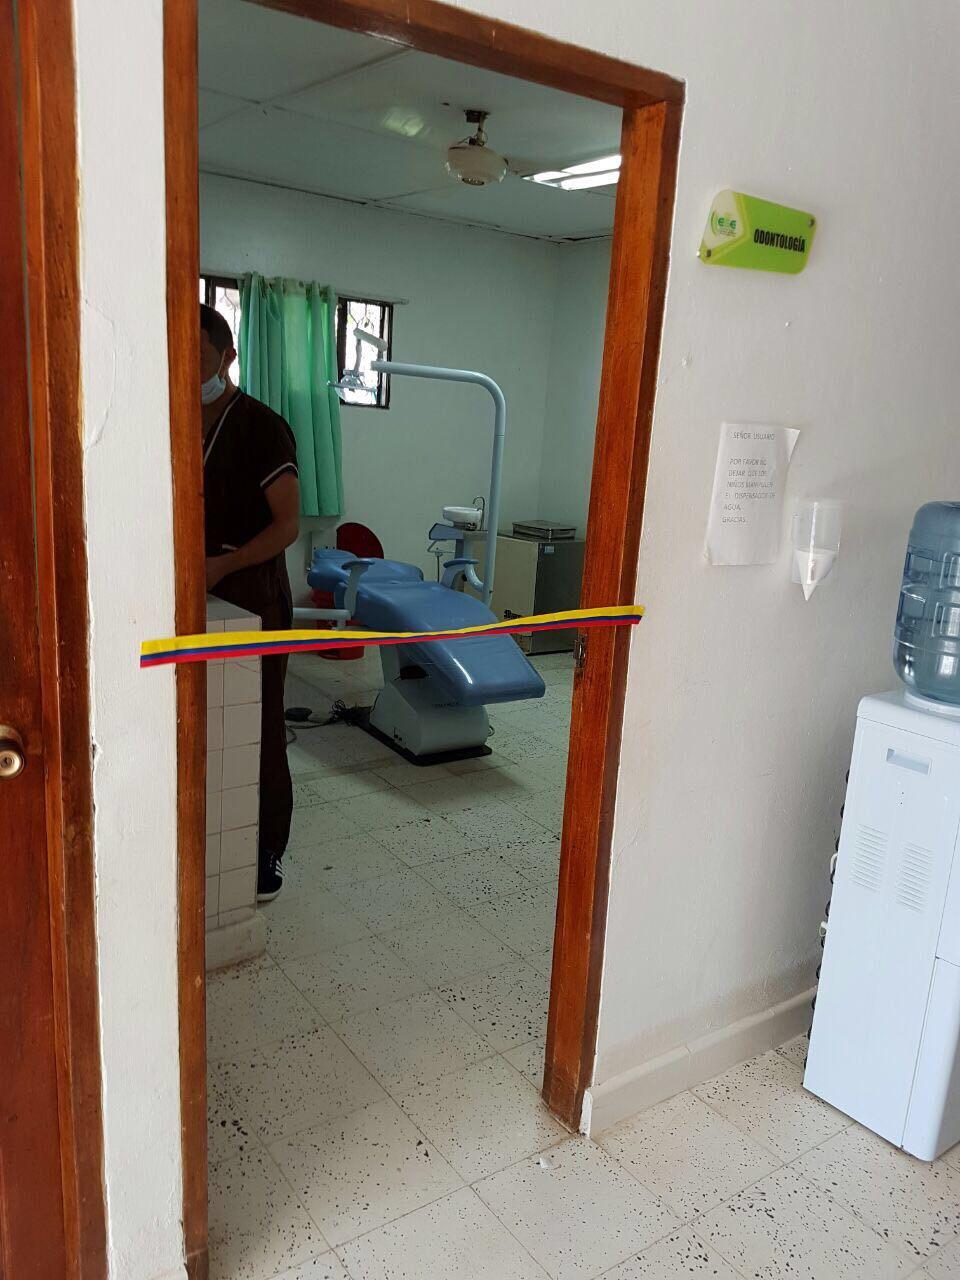 1 dental units, 1 compresor, 2 fetal dopplers, 2 mechanical baby scale